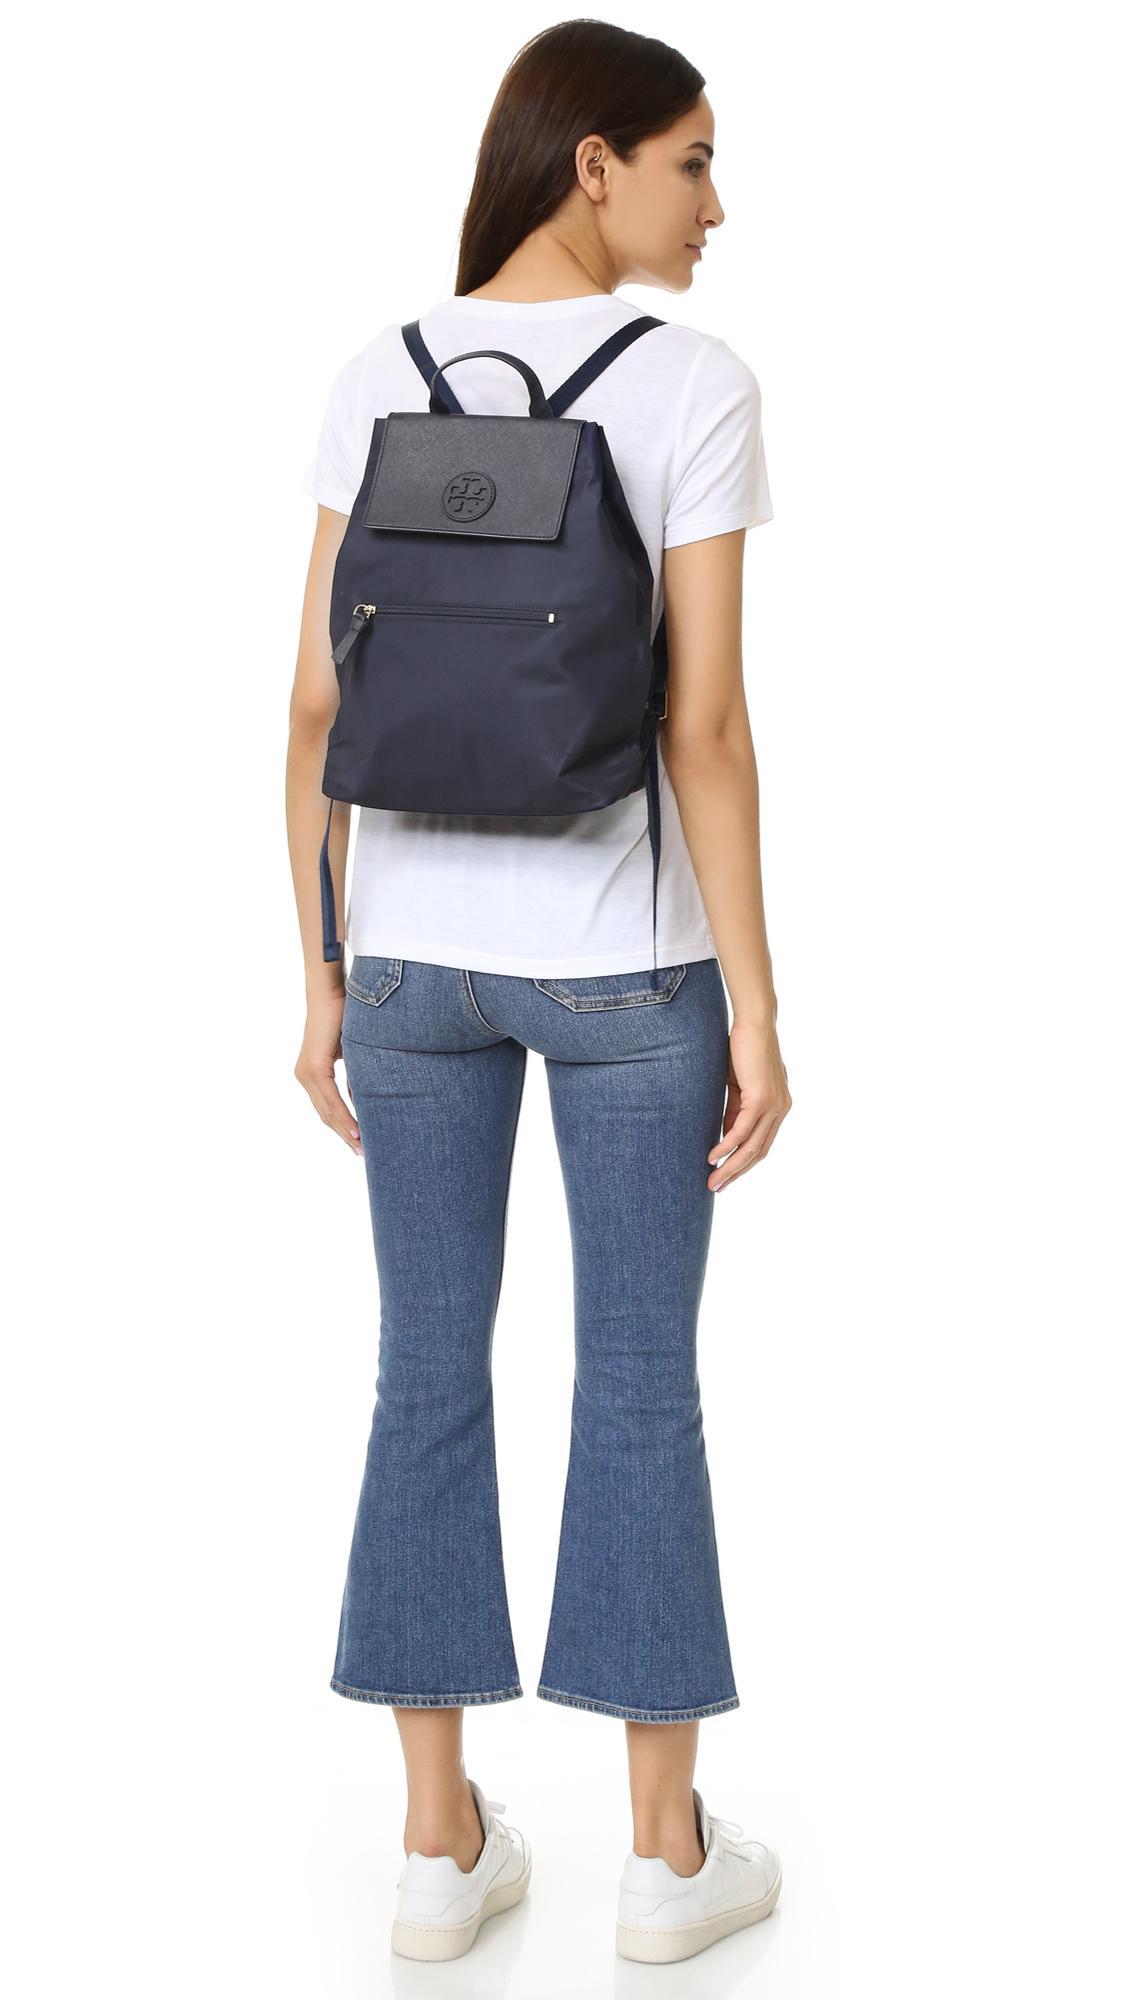 d520cd795d1b Lyst - Tory Burch Ella Packable Backpack in Blue